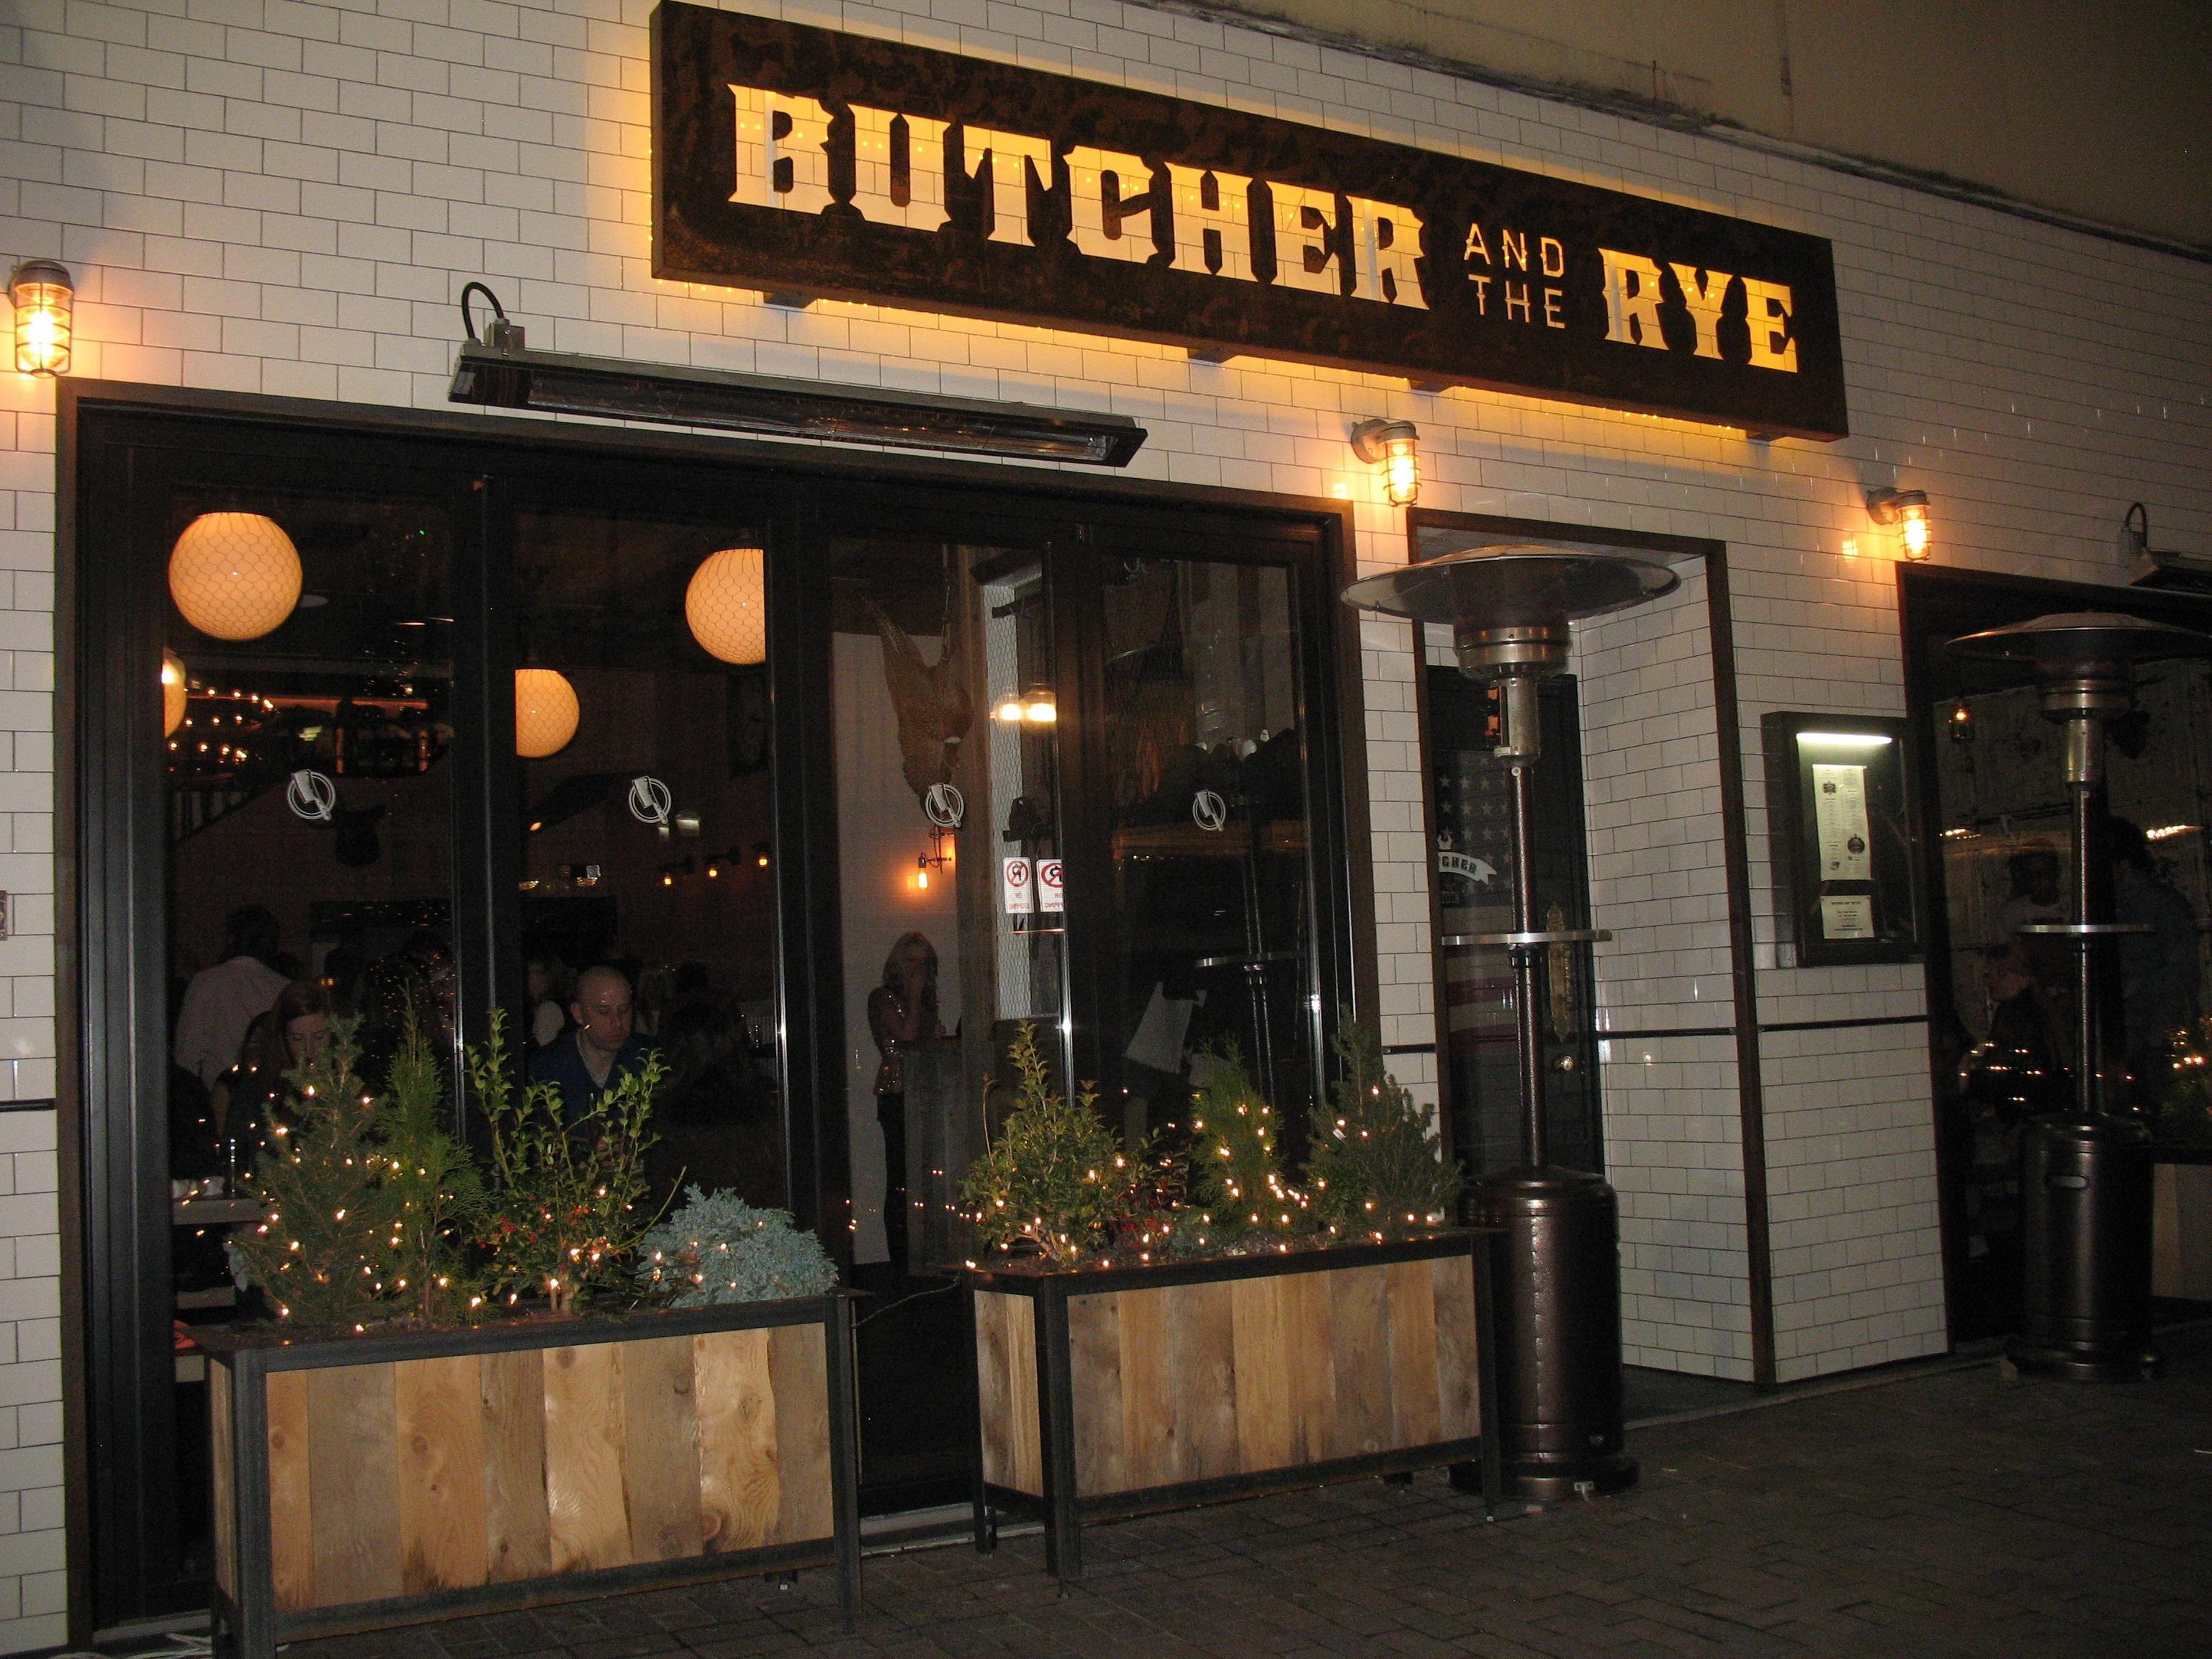 Butcher and the Rye, Pittsburgh Pittsburgh restaurants